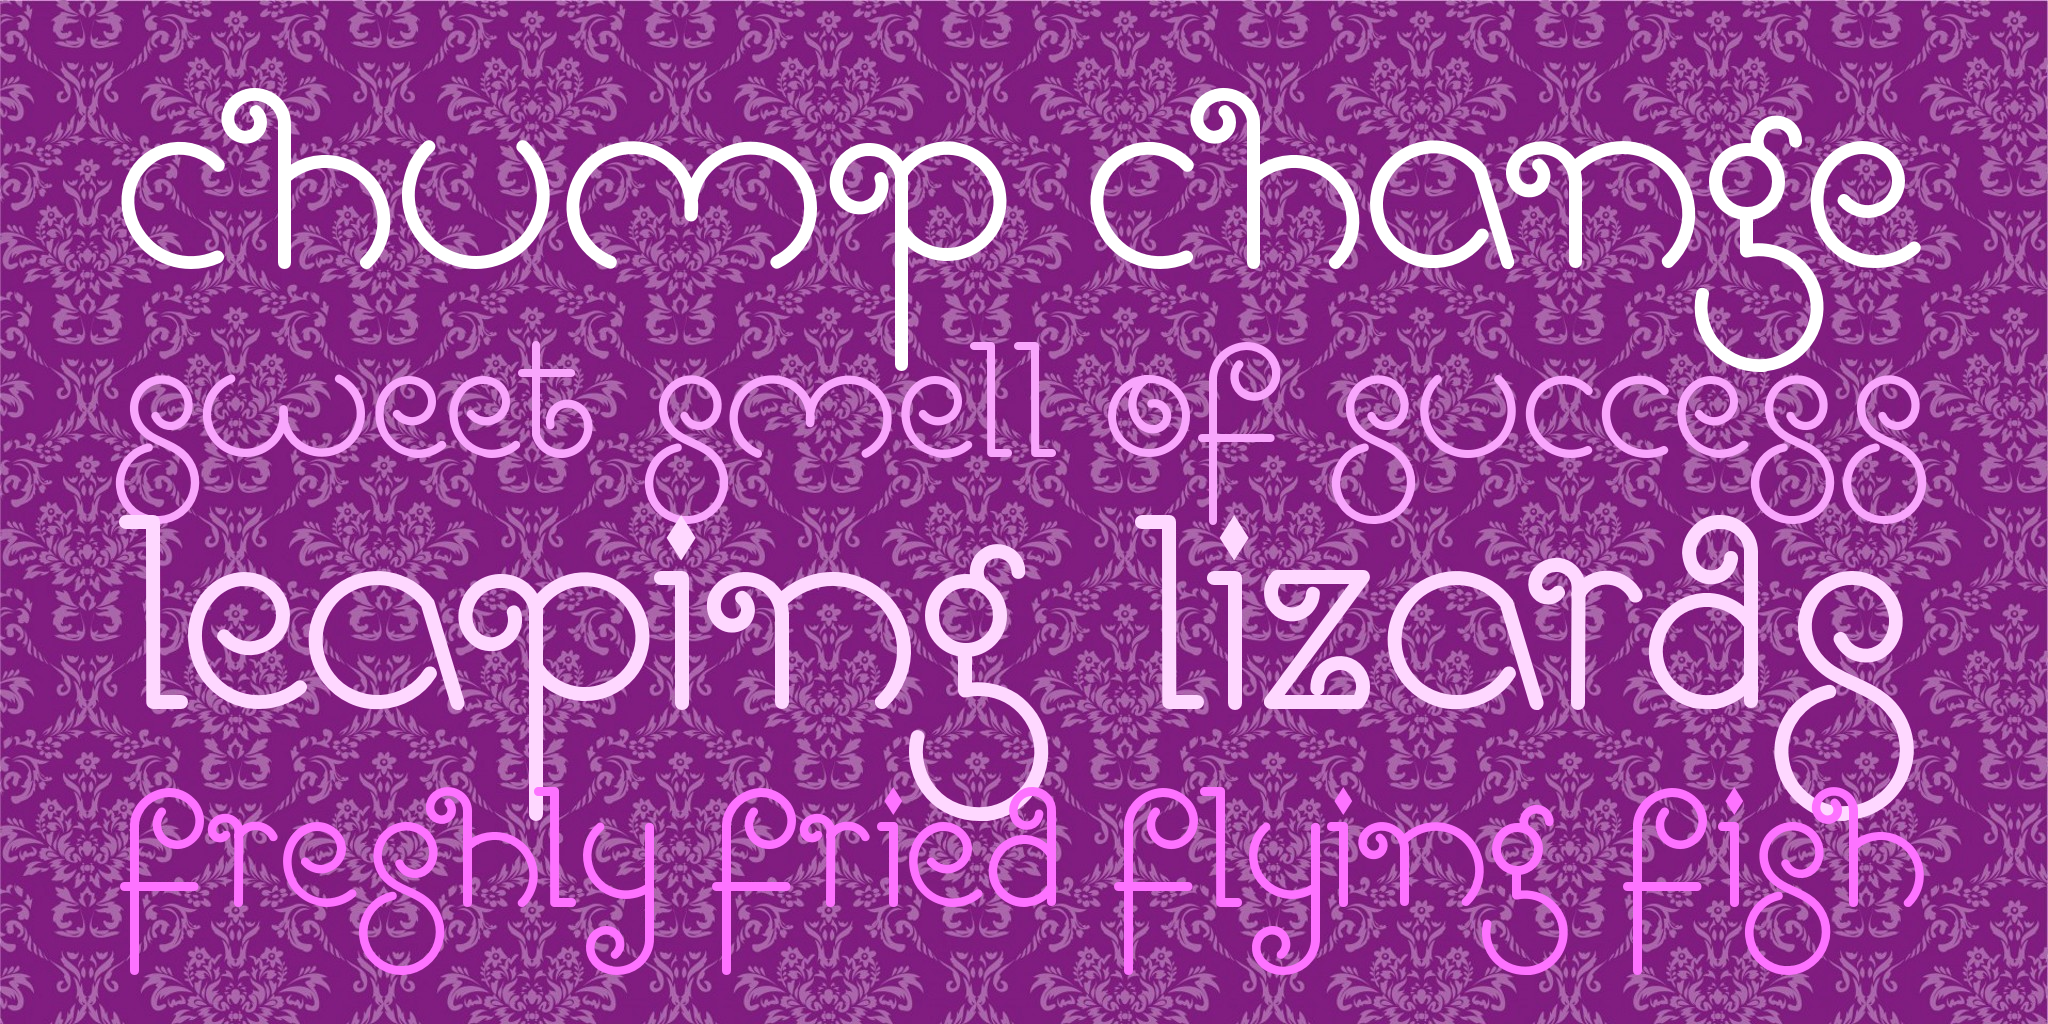 Bright Like A Diamond Font · 1001 Fonts | Font | Fonts, Bright, Neon